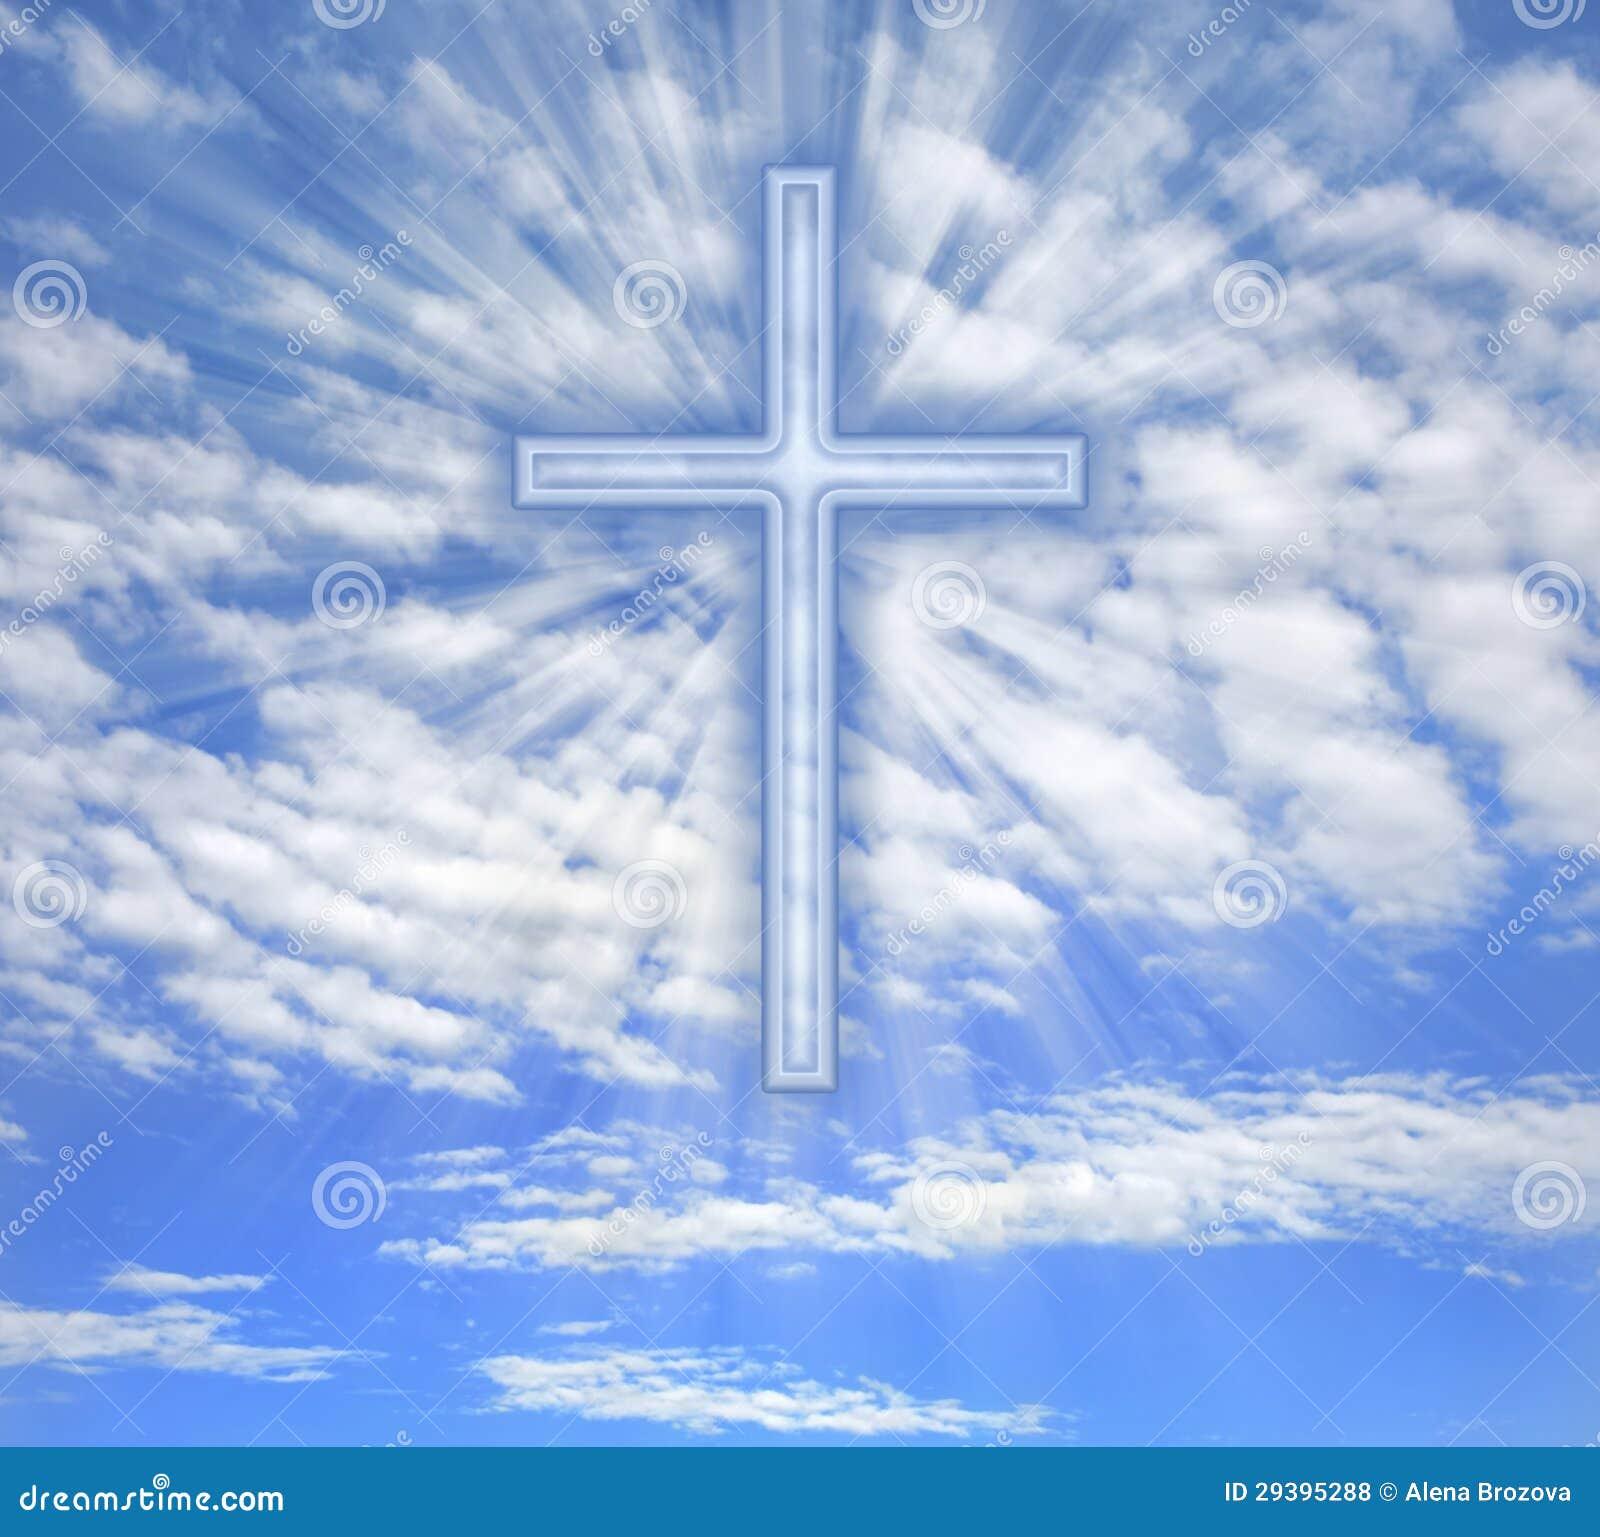 Christian Cross With Light Beams Over Sky Stock